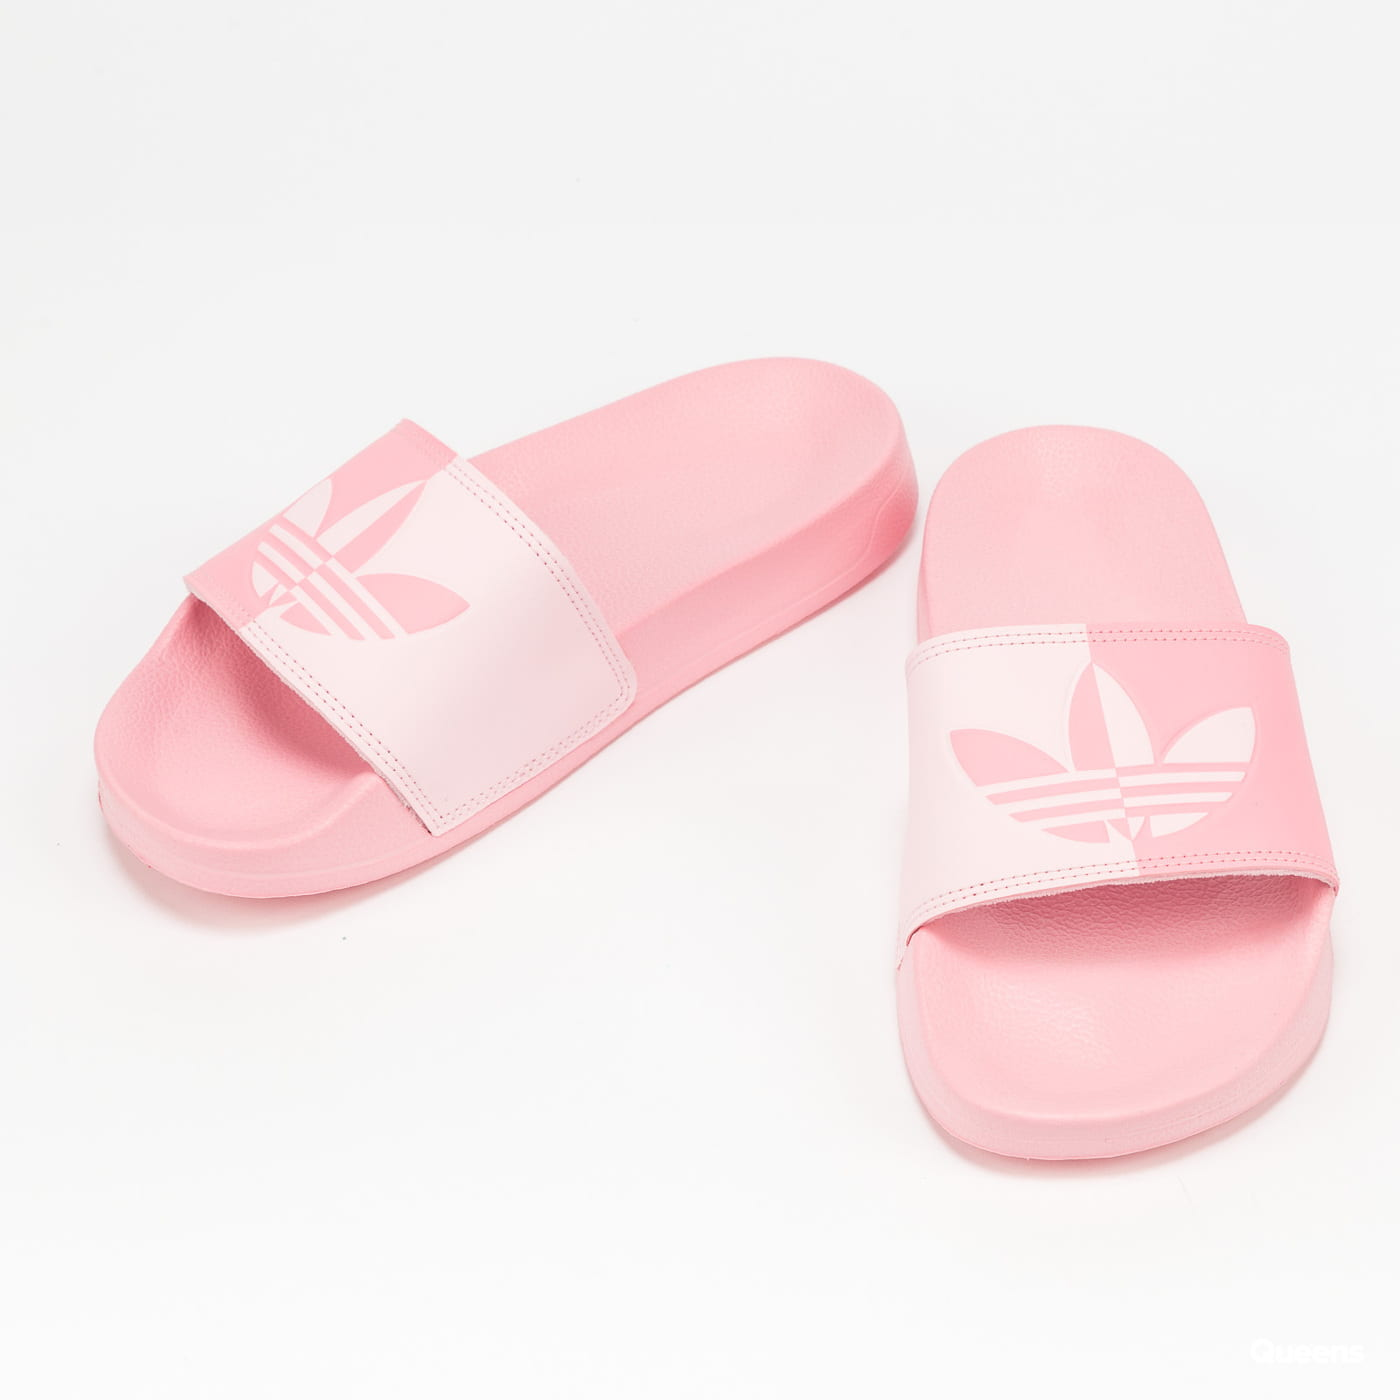 adidas Originals Adilette Lite W clpink / ltpink / clpink